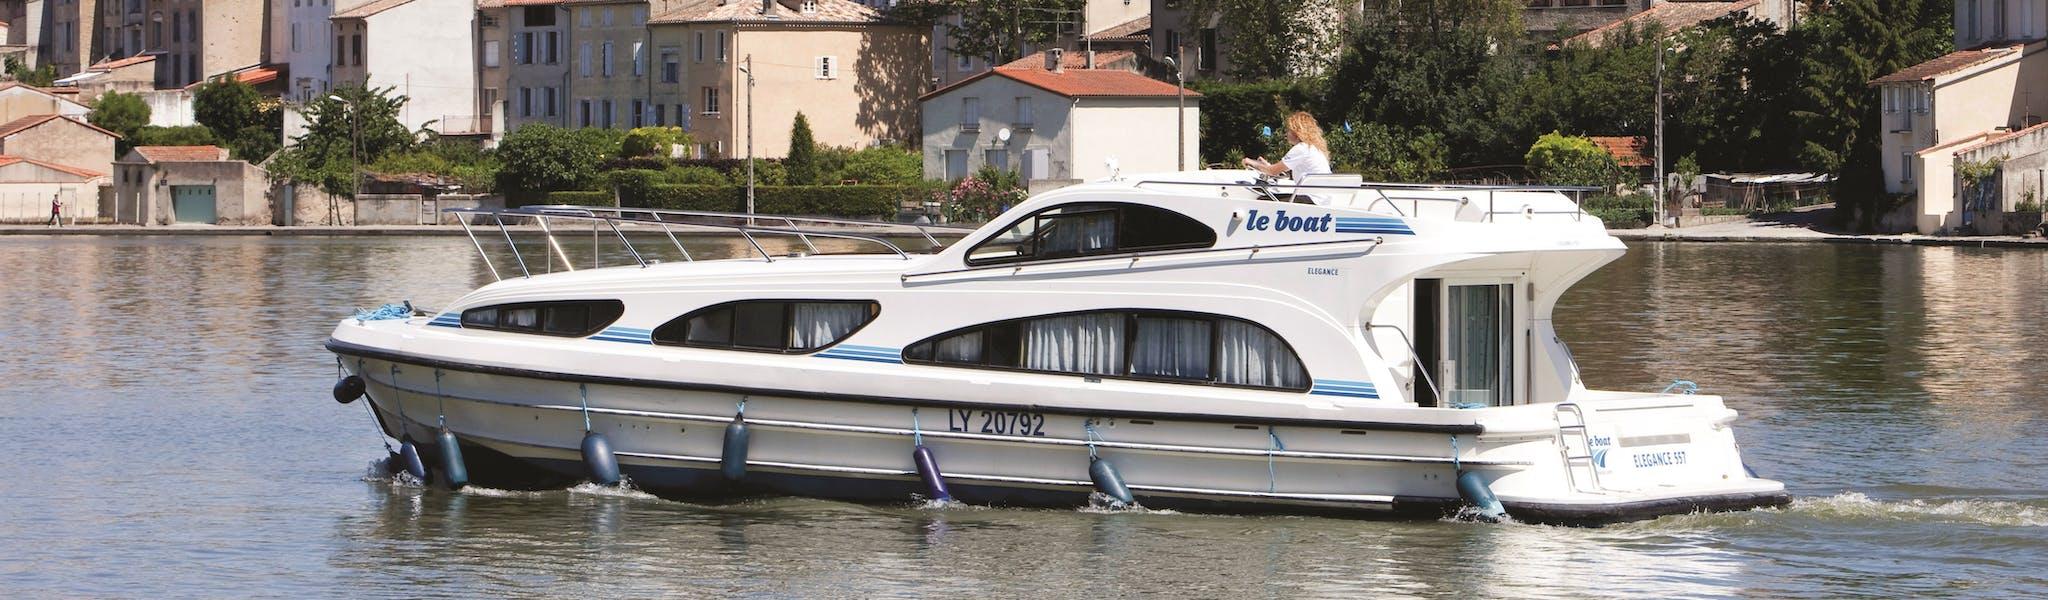 Elegance boot leboat